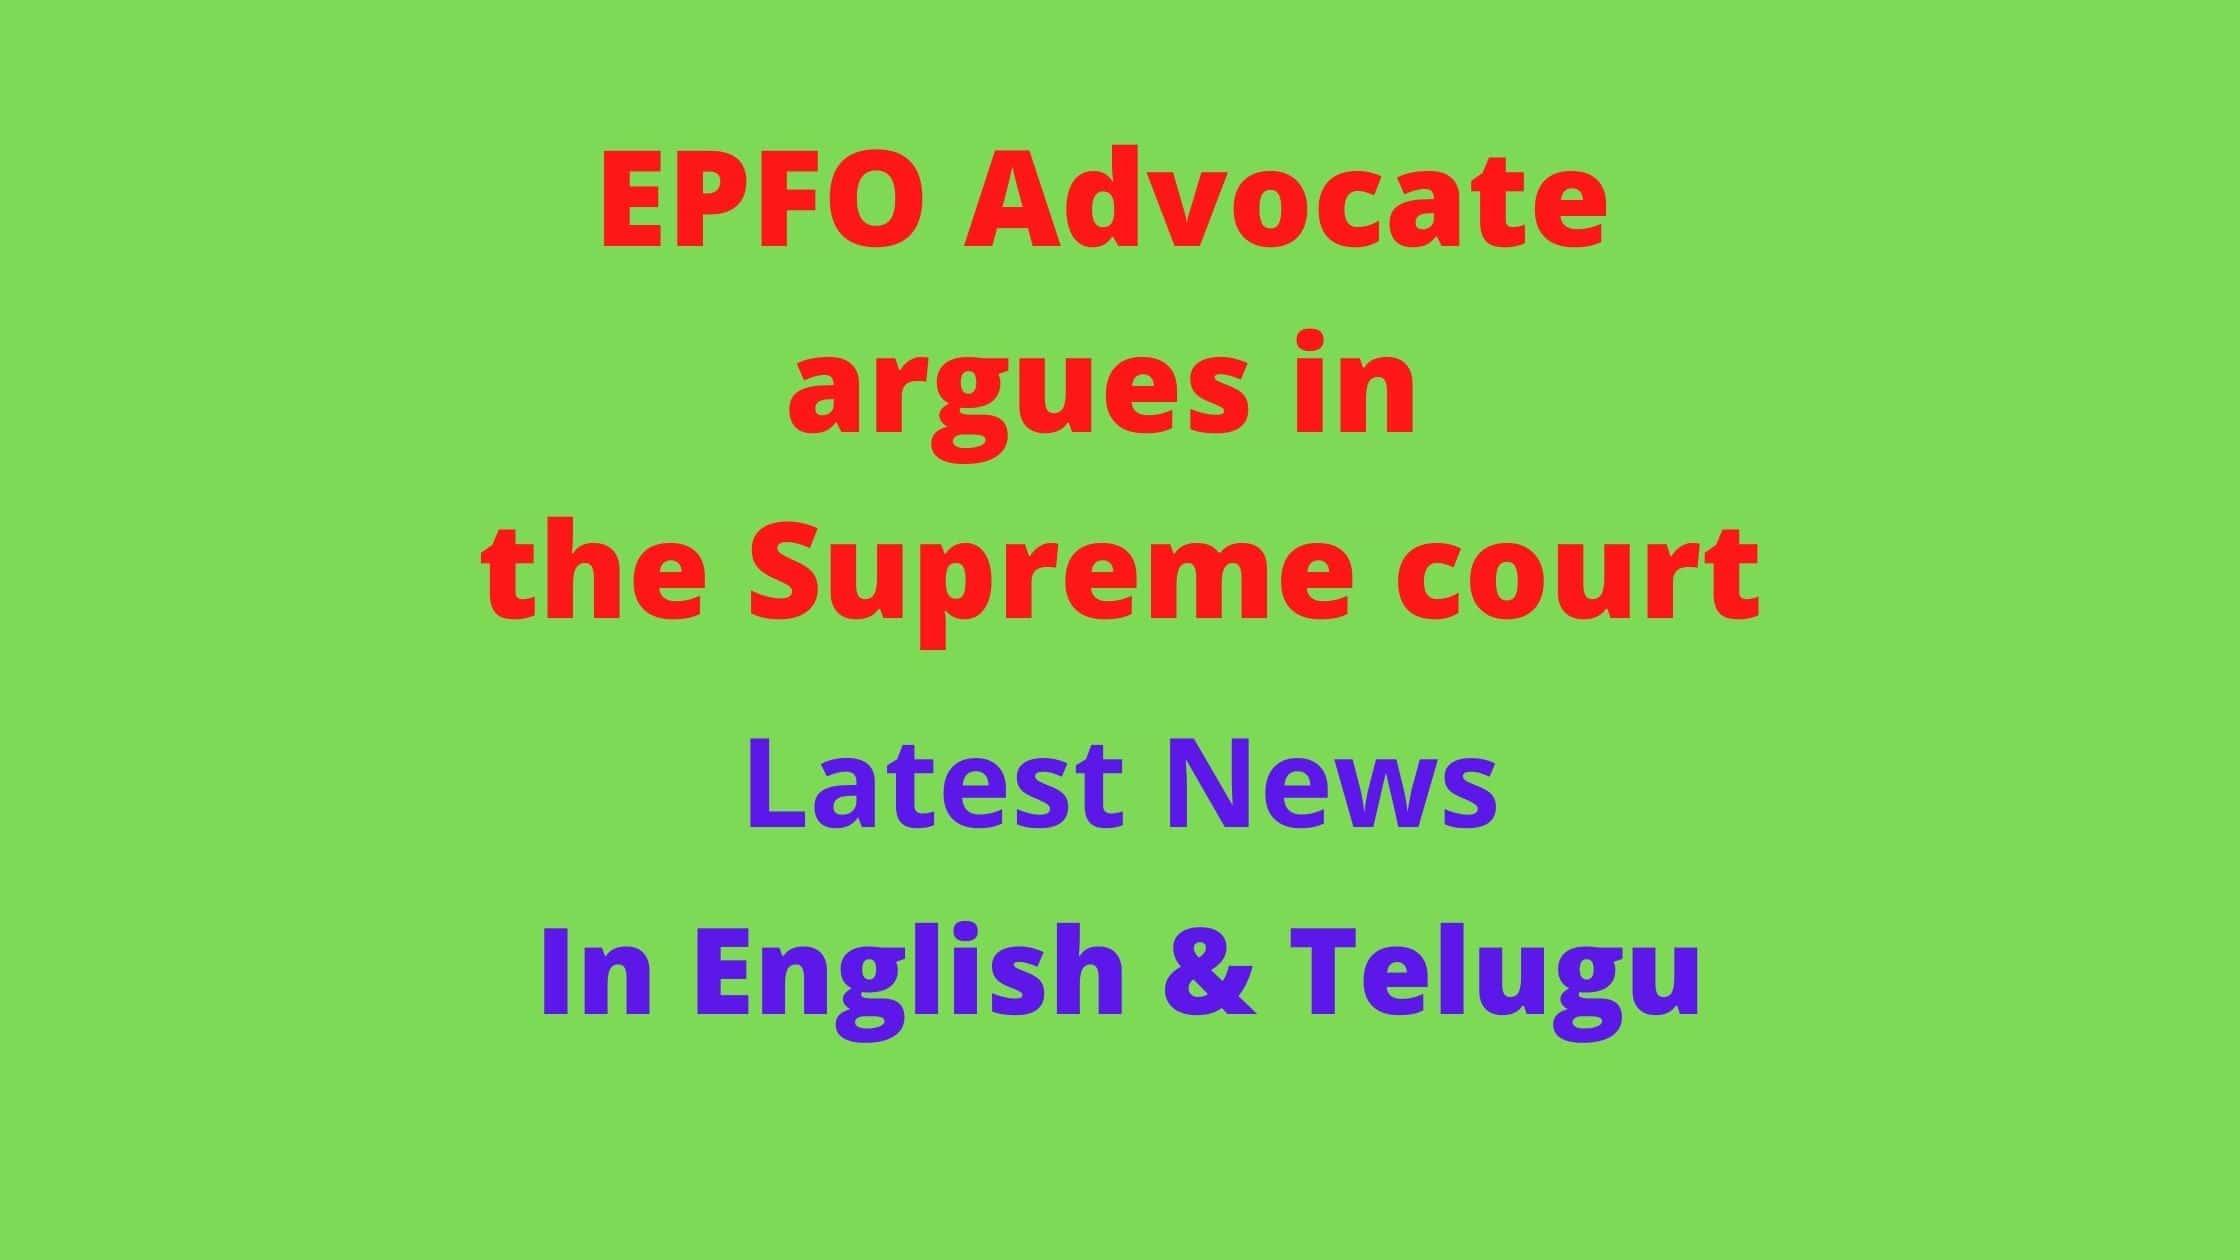 EPFO Advocate argues in the Supreme court